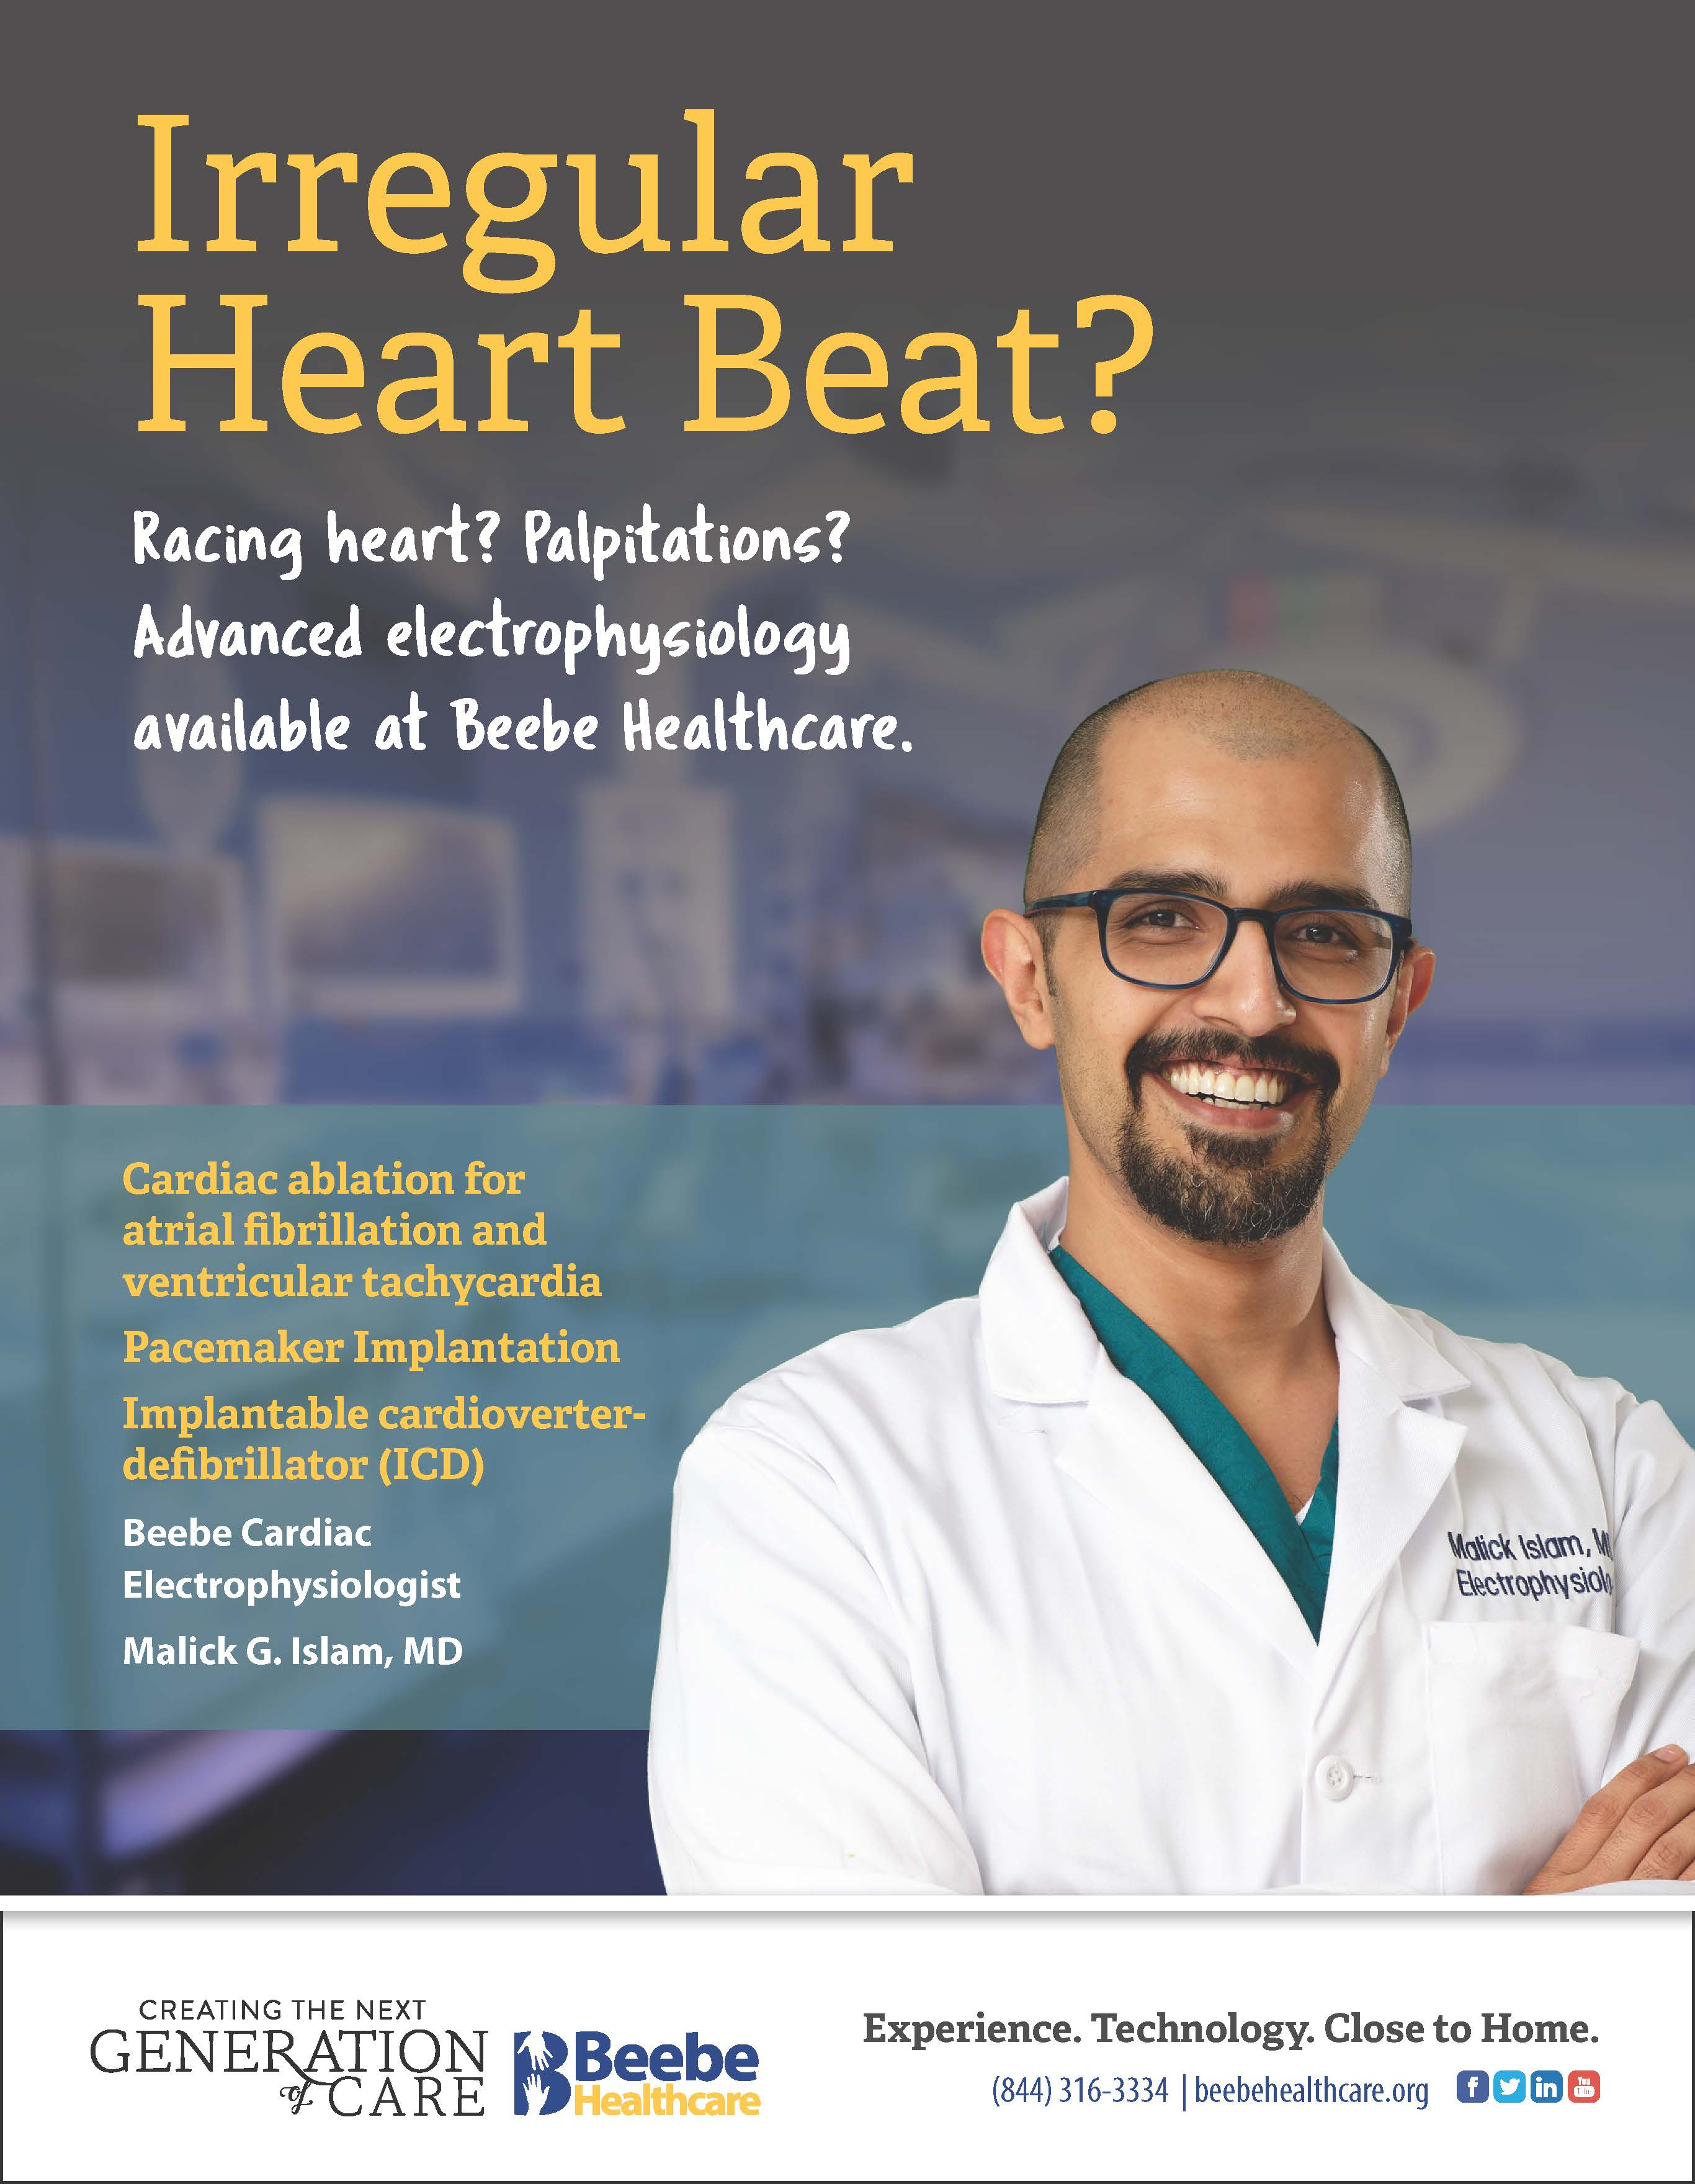 Malick Islam, MD. Delaware Cardiovascular Associates. Call (302) 644-7676.